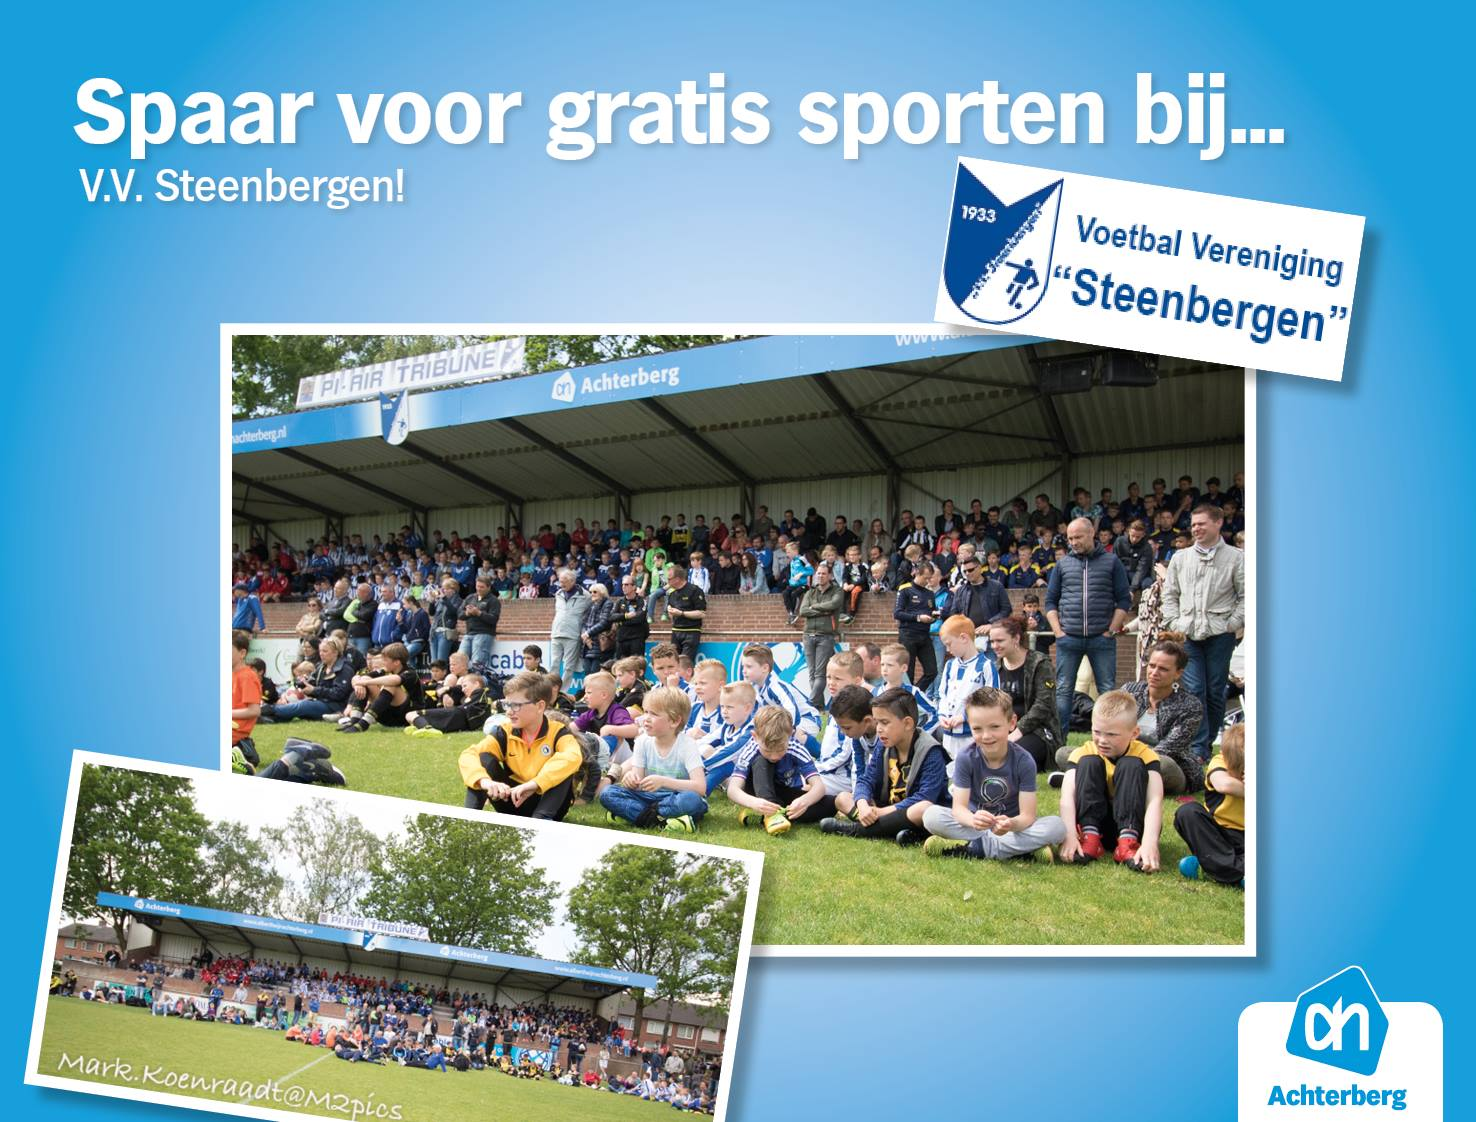 5 x gratis sporten bij V.V. Steenbergen!